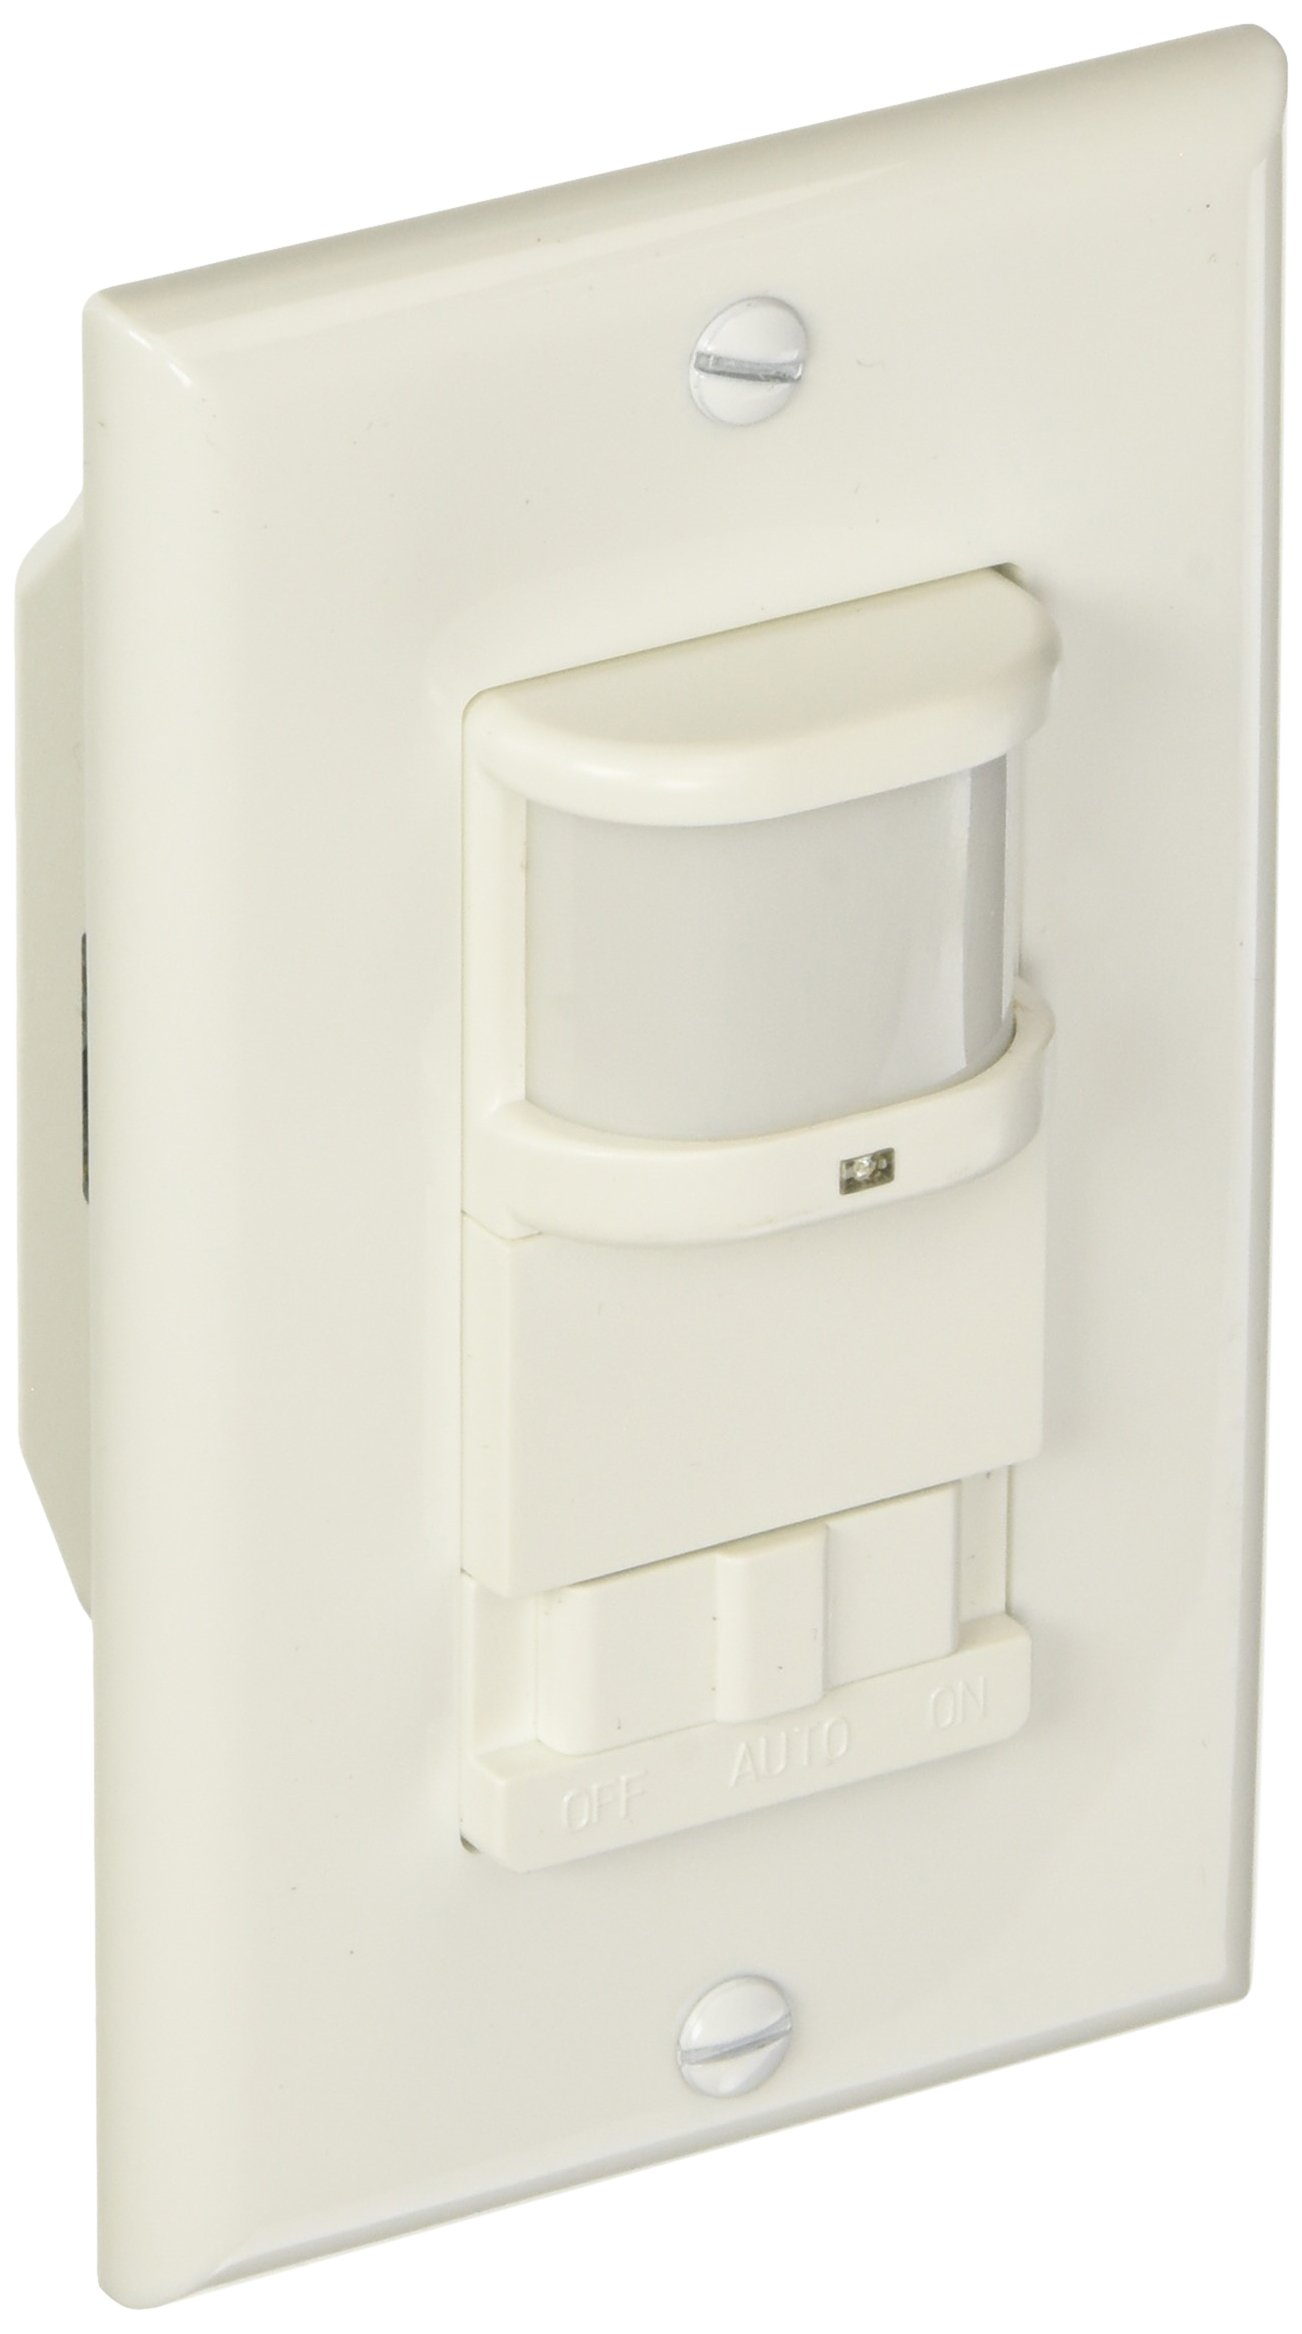 Westgate YM2105-W Occupancy Motion Sensors Wall Switch, White